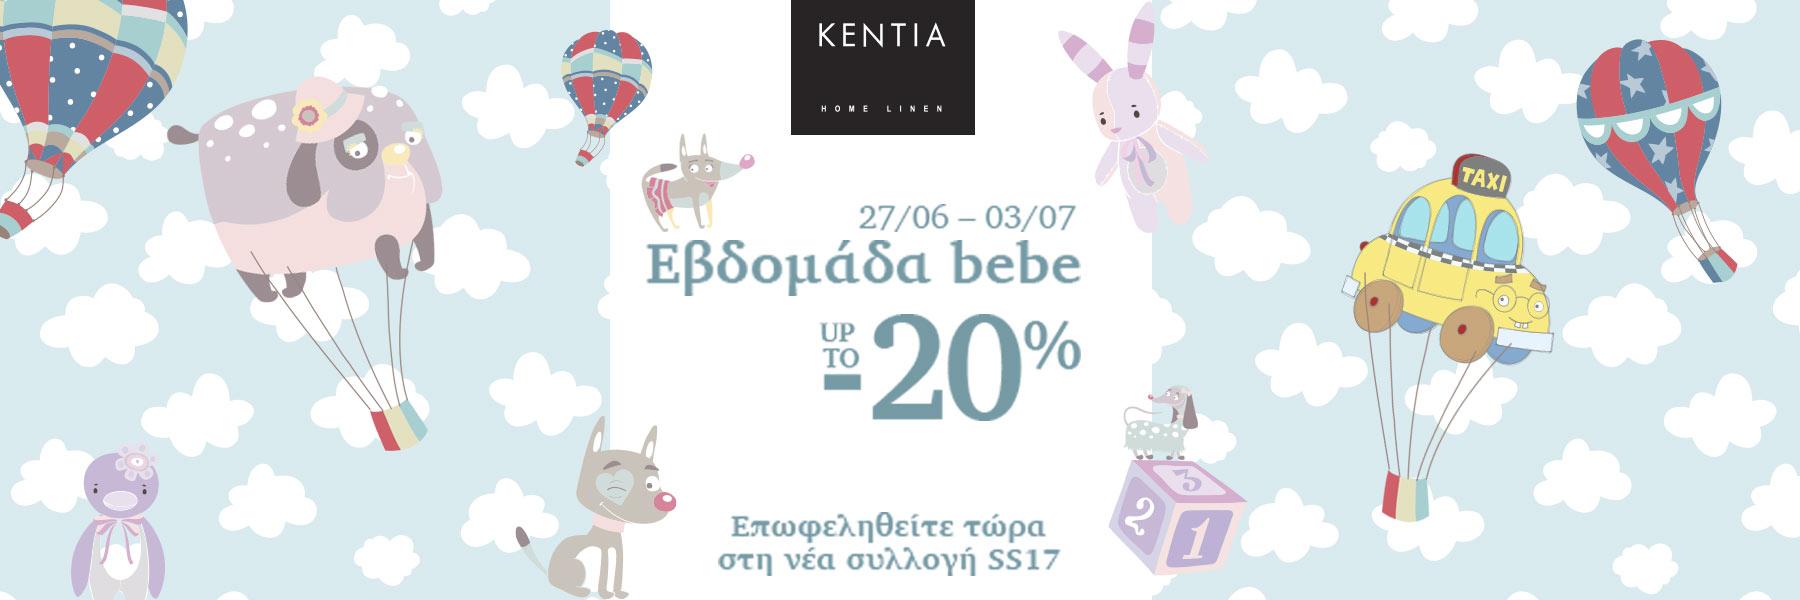 KENTIA_BEBE_SLIDERl-TELIKO